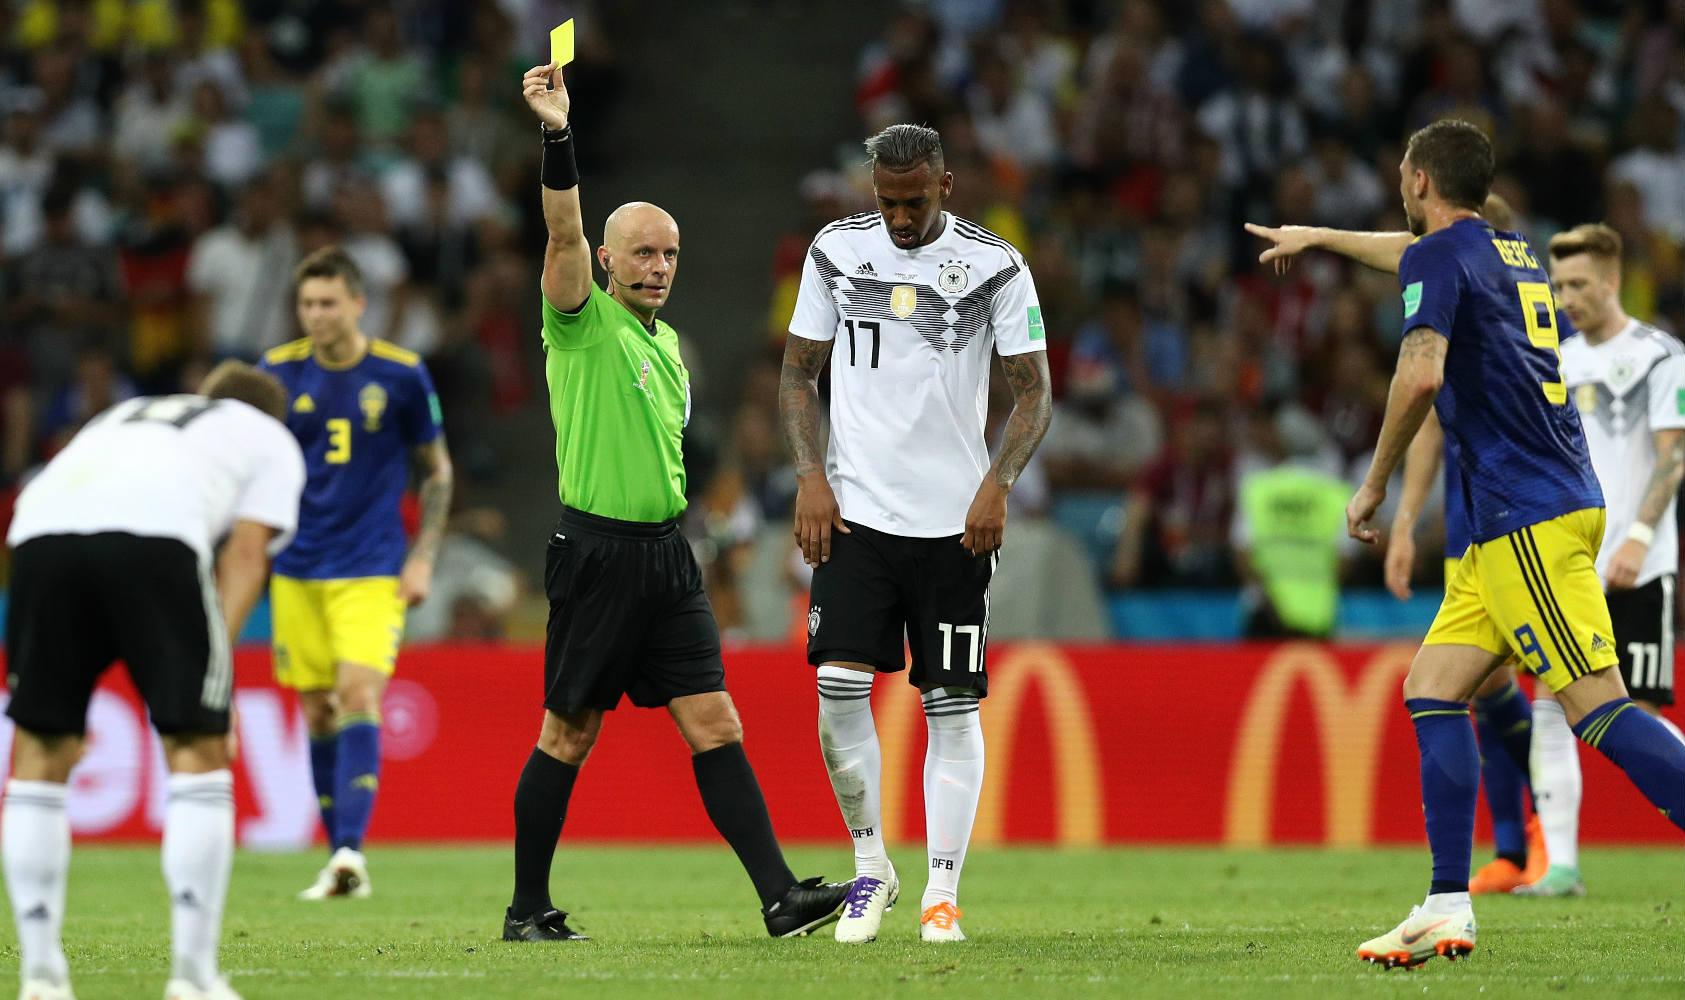 Jerome Boateng expulso Alemanha Suecia Copa 2018